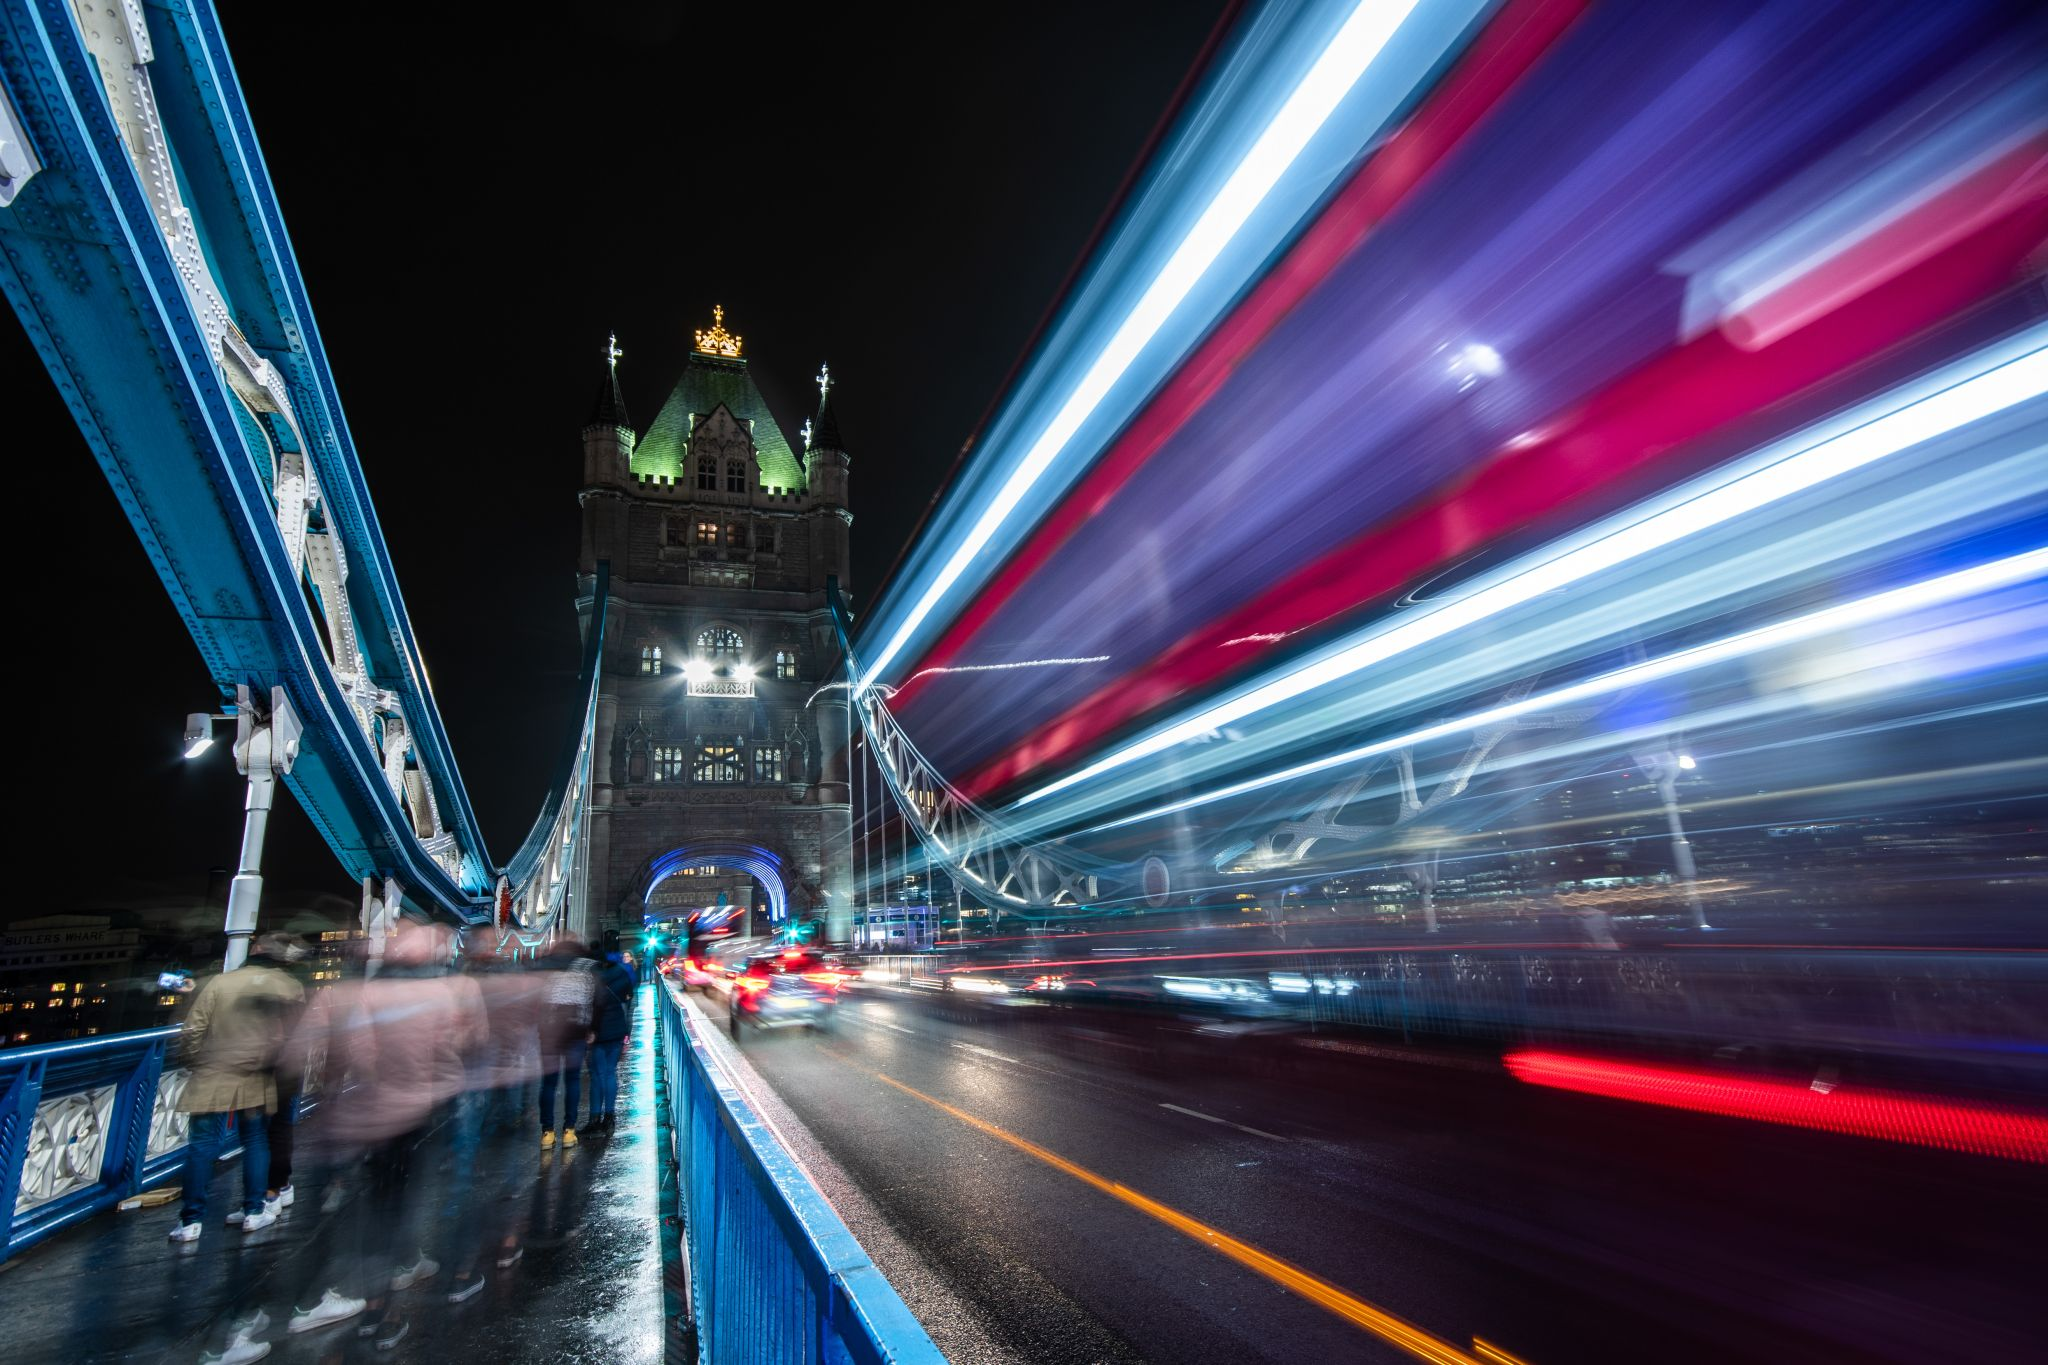 Tower Bridge Roadside, United Kingdom